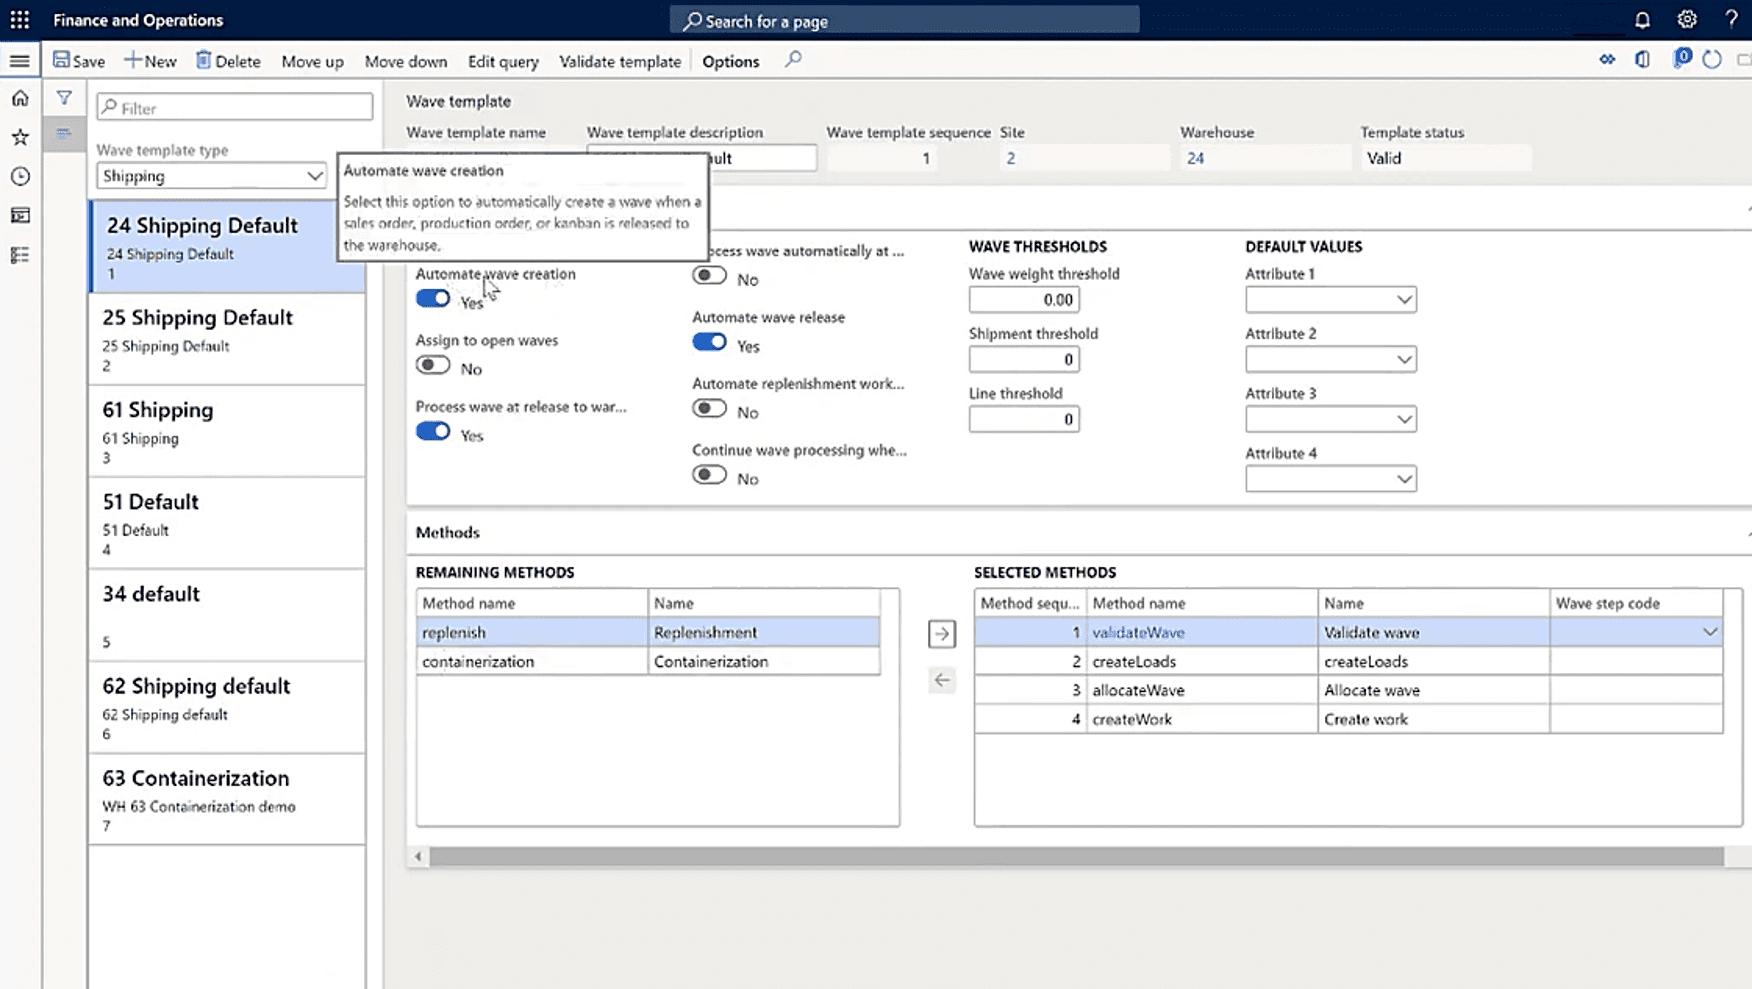 Microsoft inventory management tool